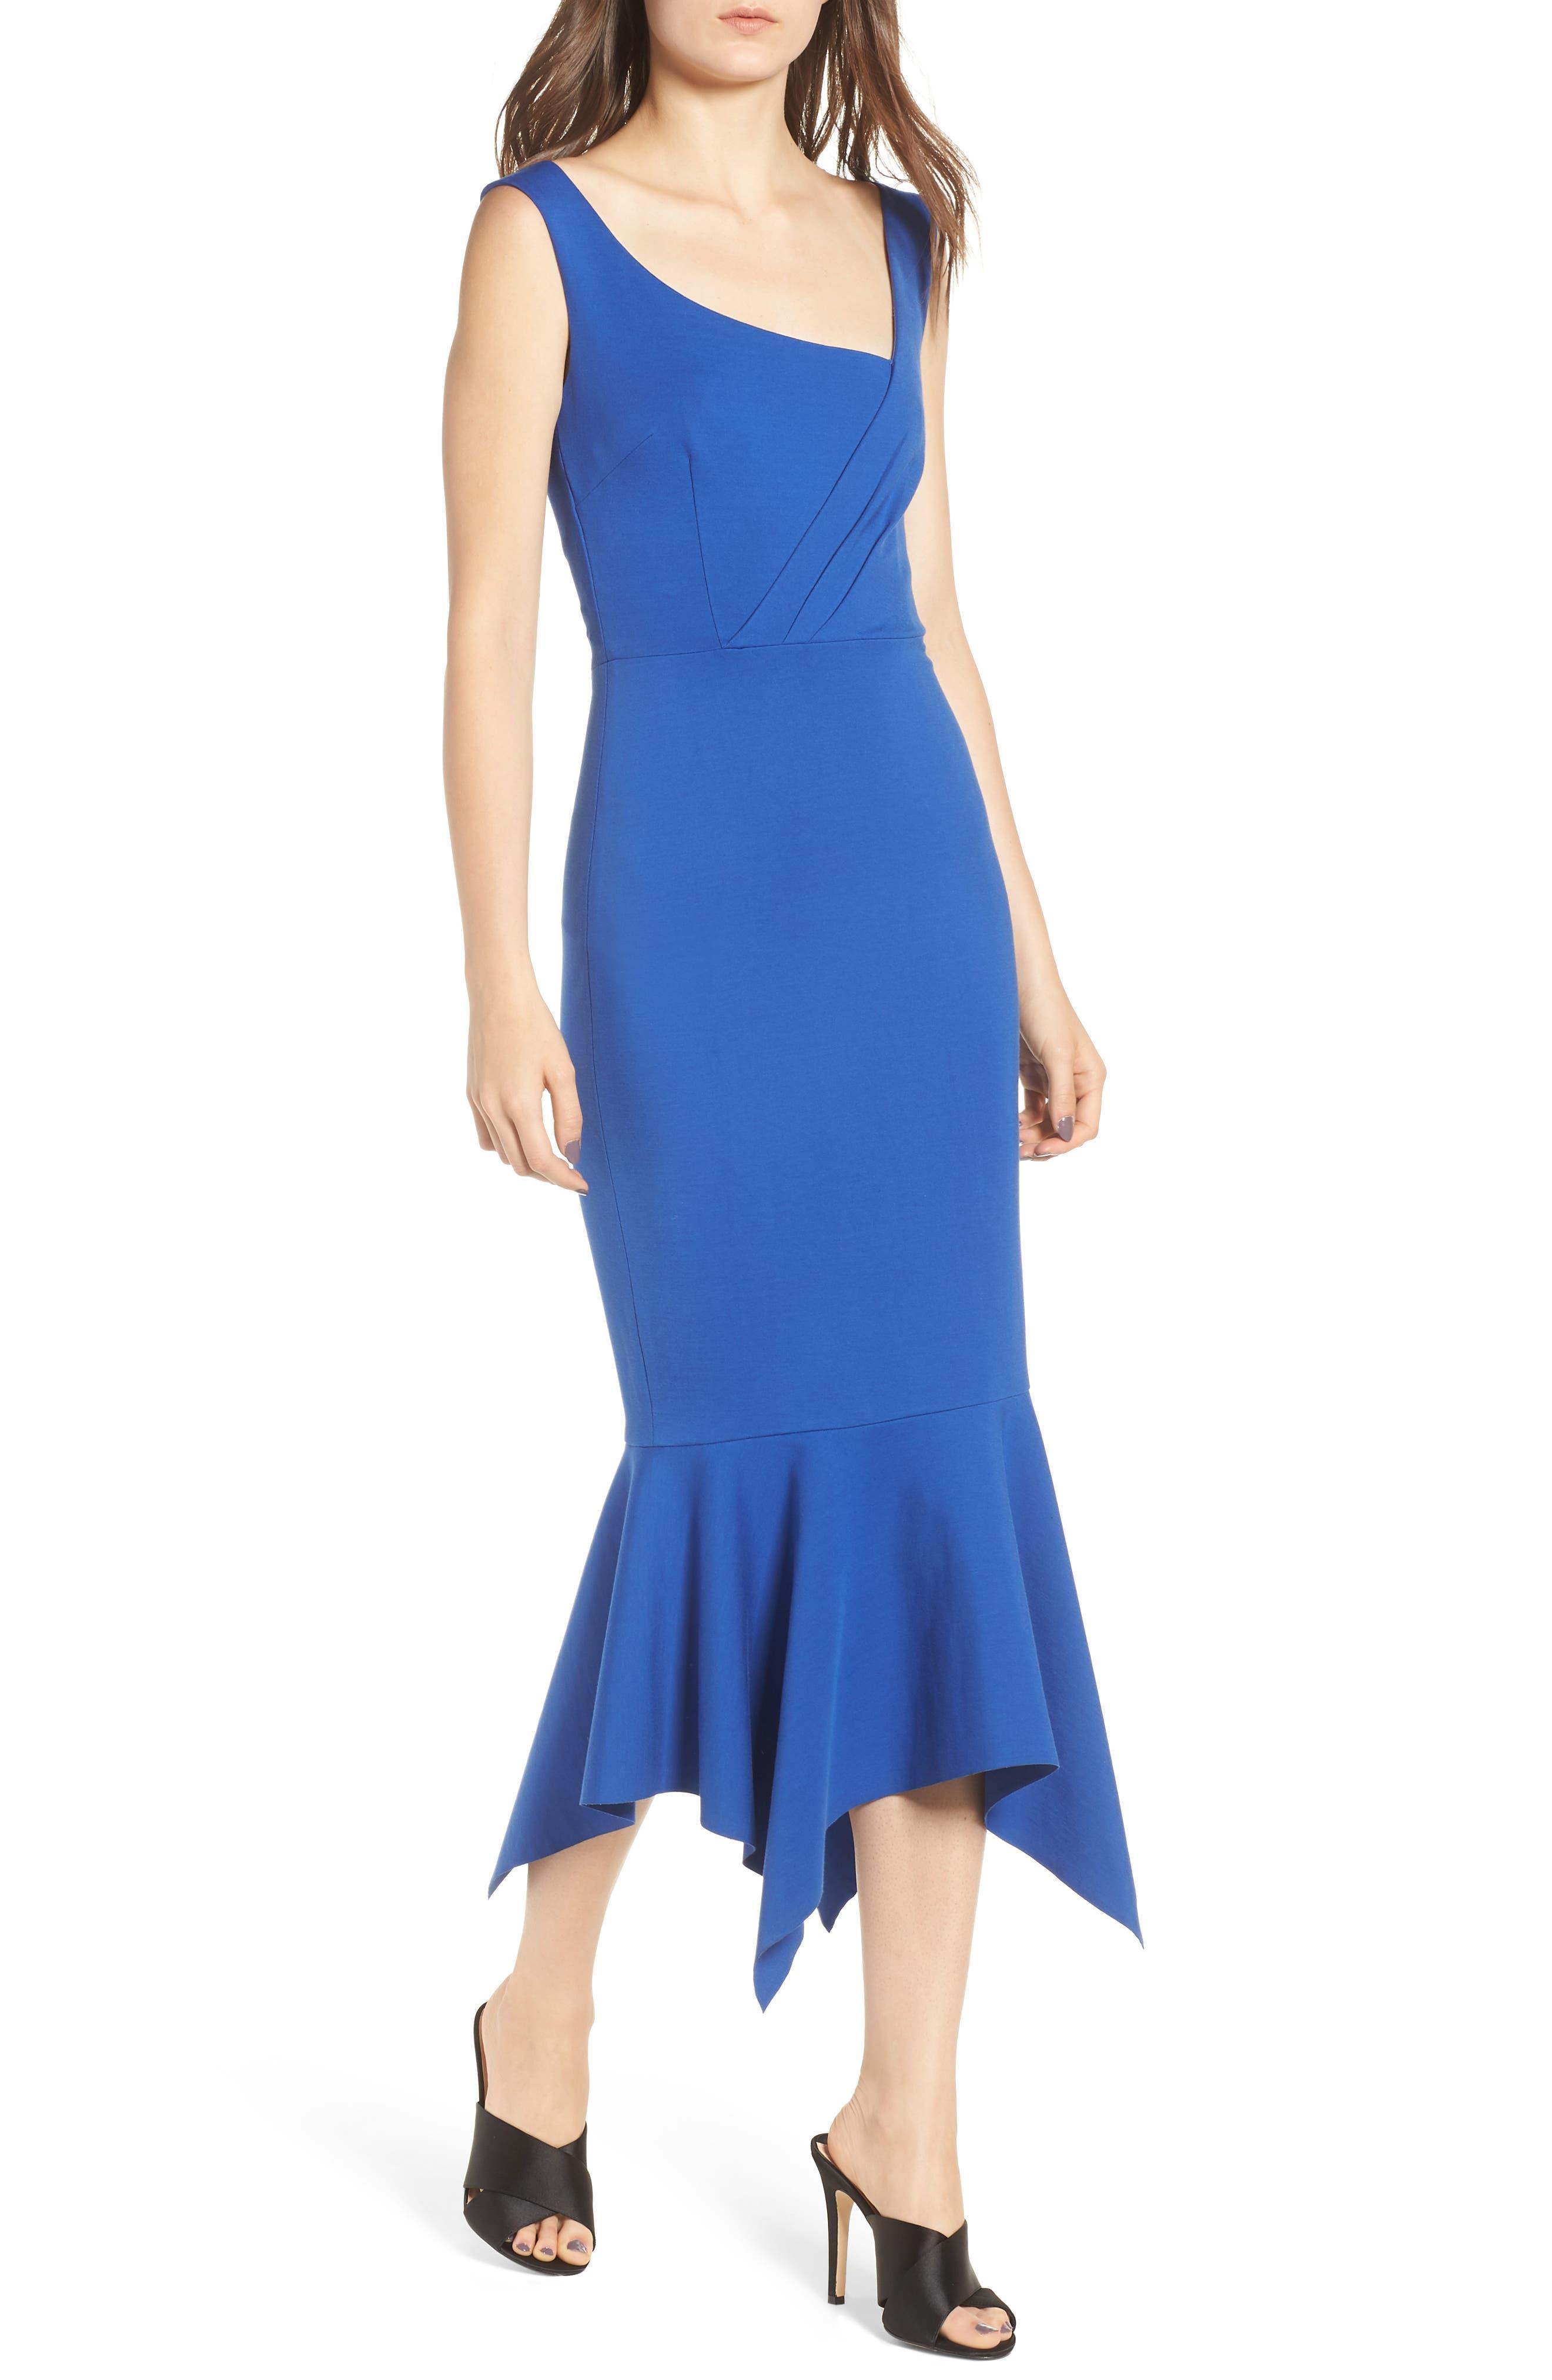 Viola Asymmetrical Dress,                             Main thumbnail 1, color,                             460